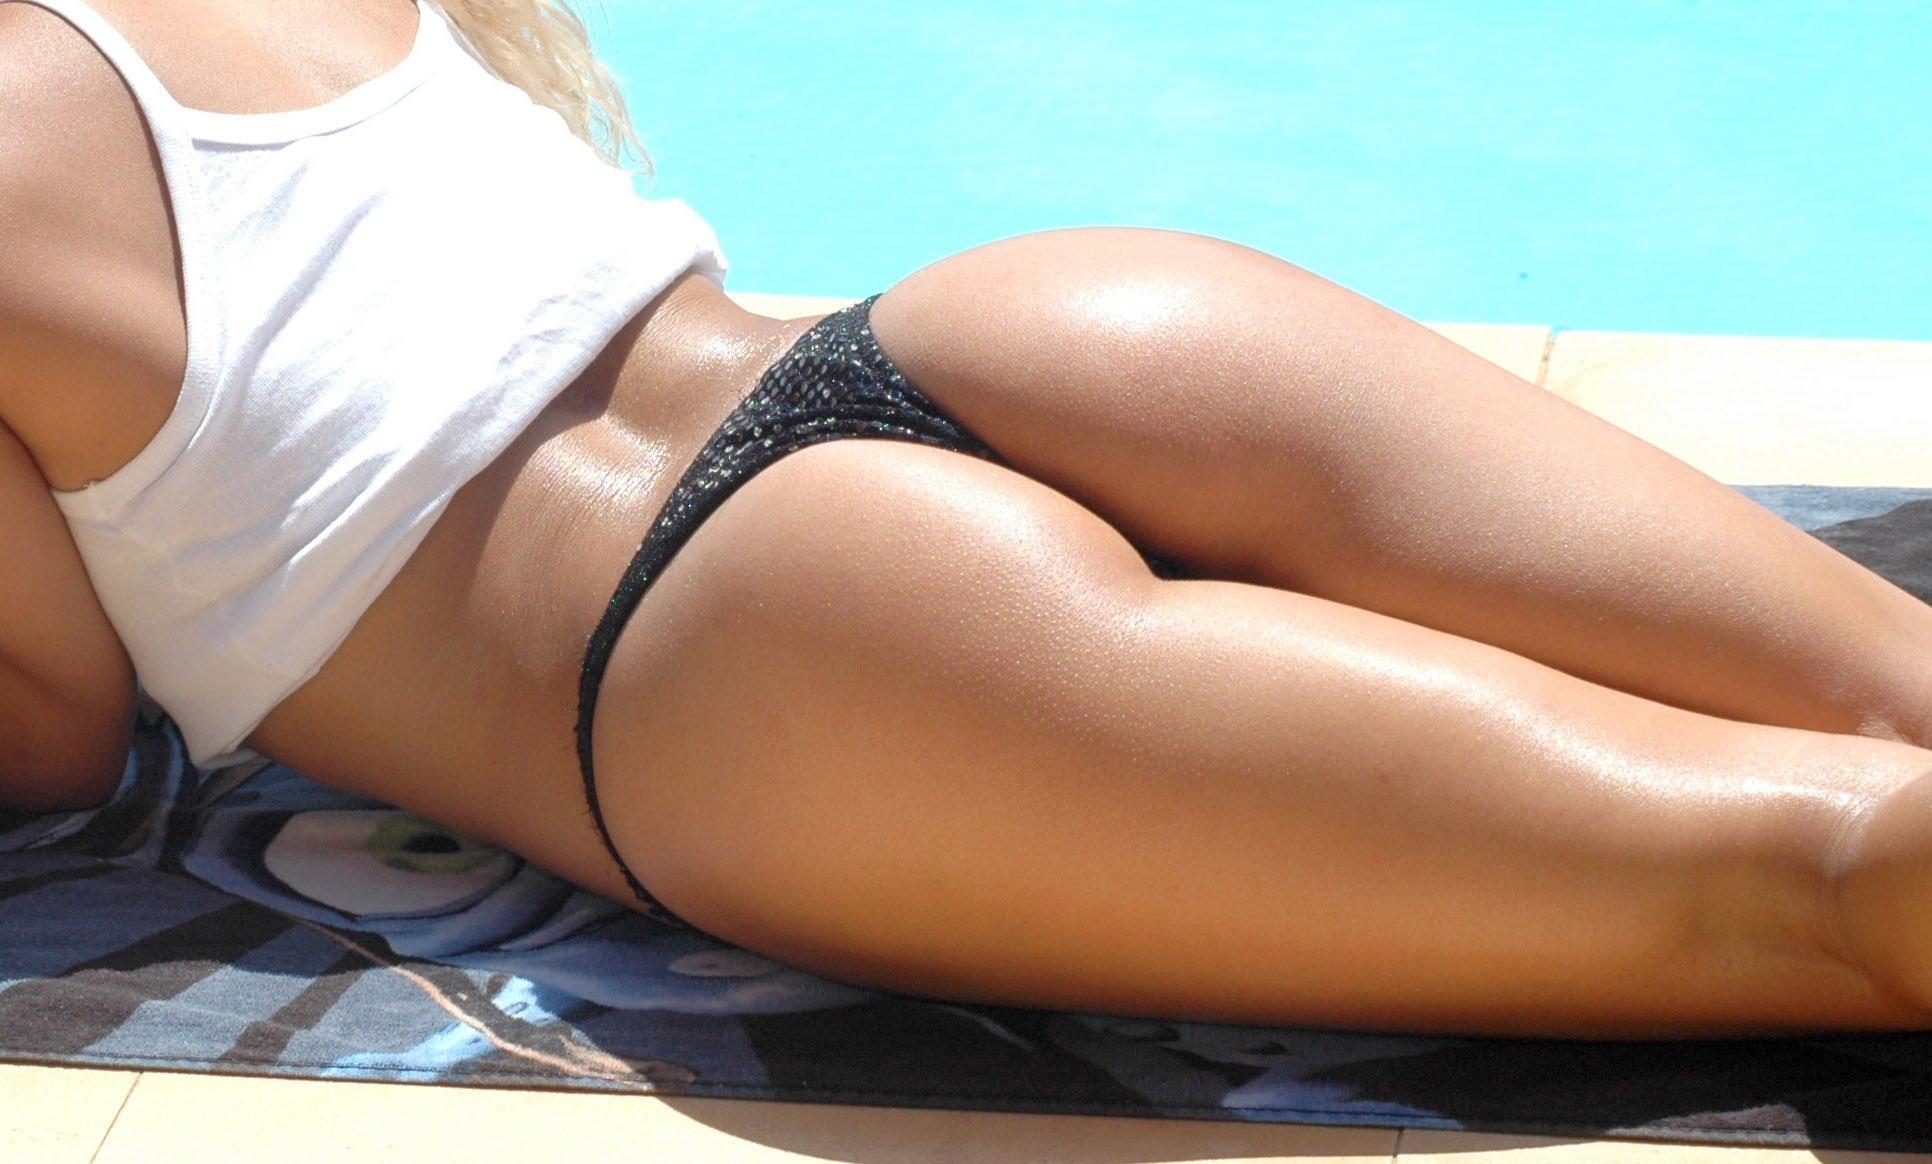 Hot Ass Images